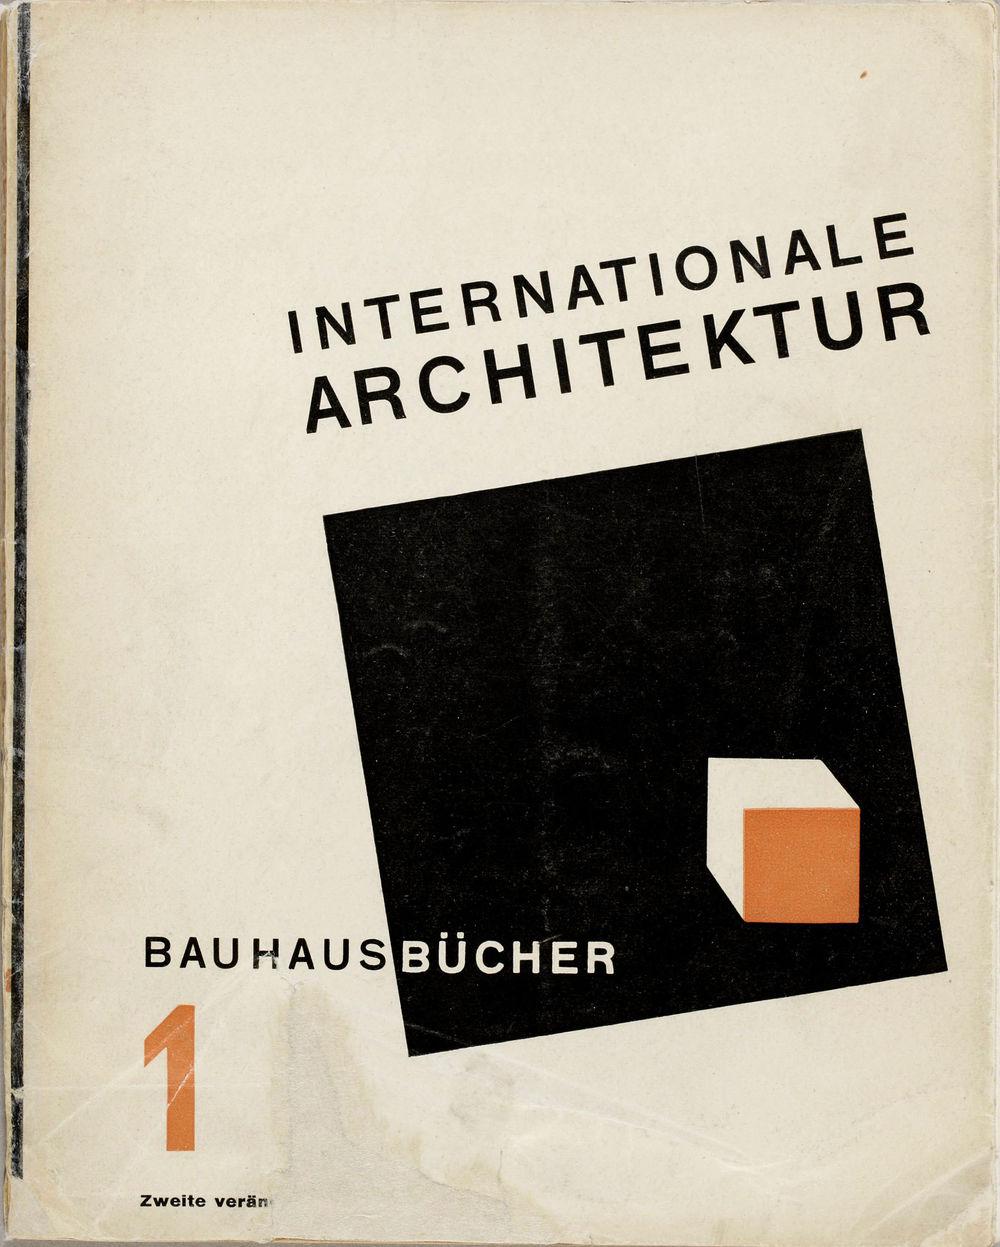 Laszlo Moholy-Nagy -  Baugausbücher  (1925)